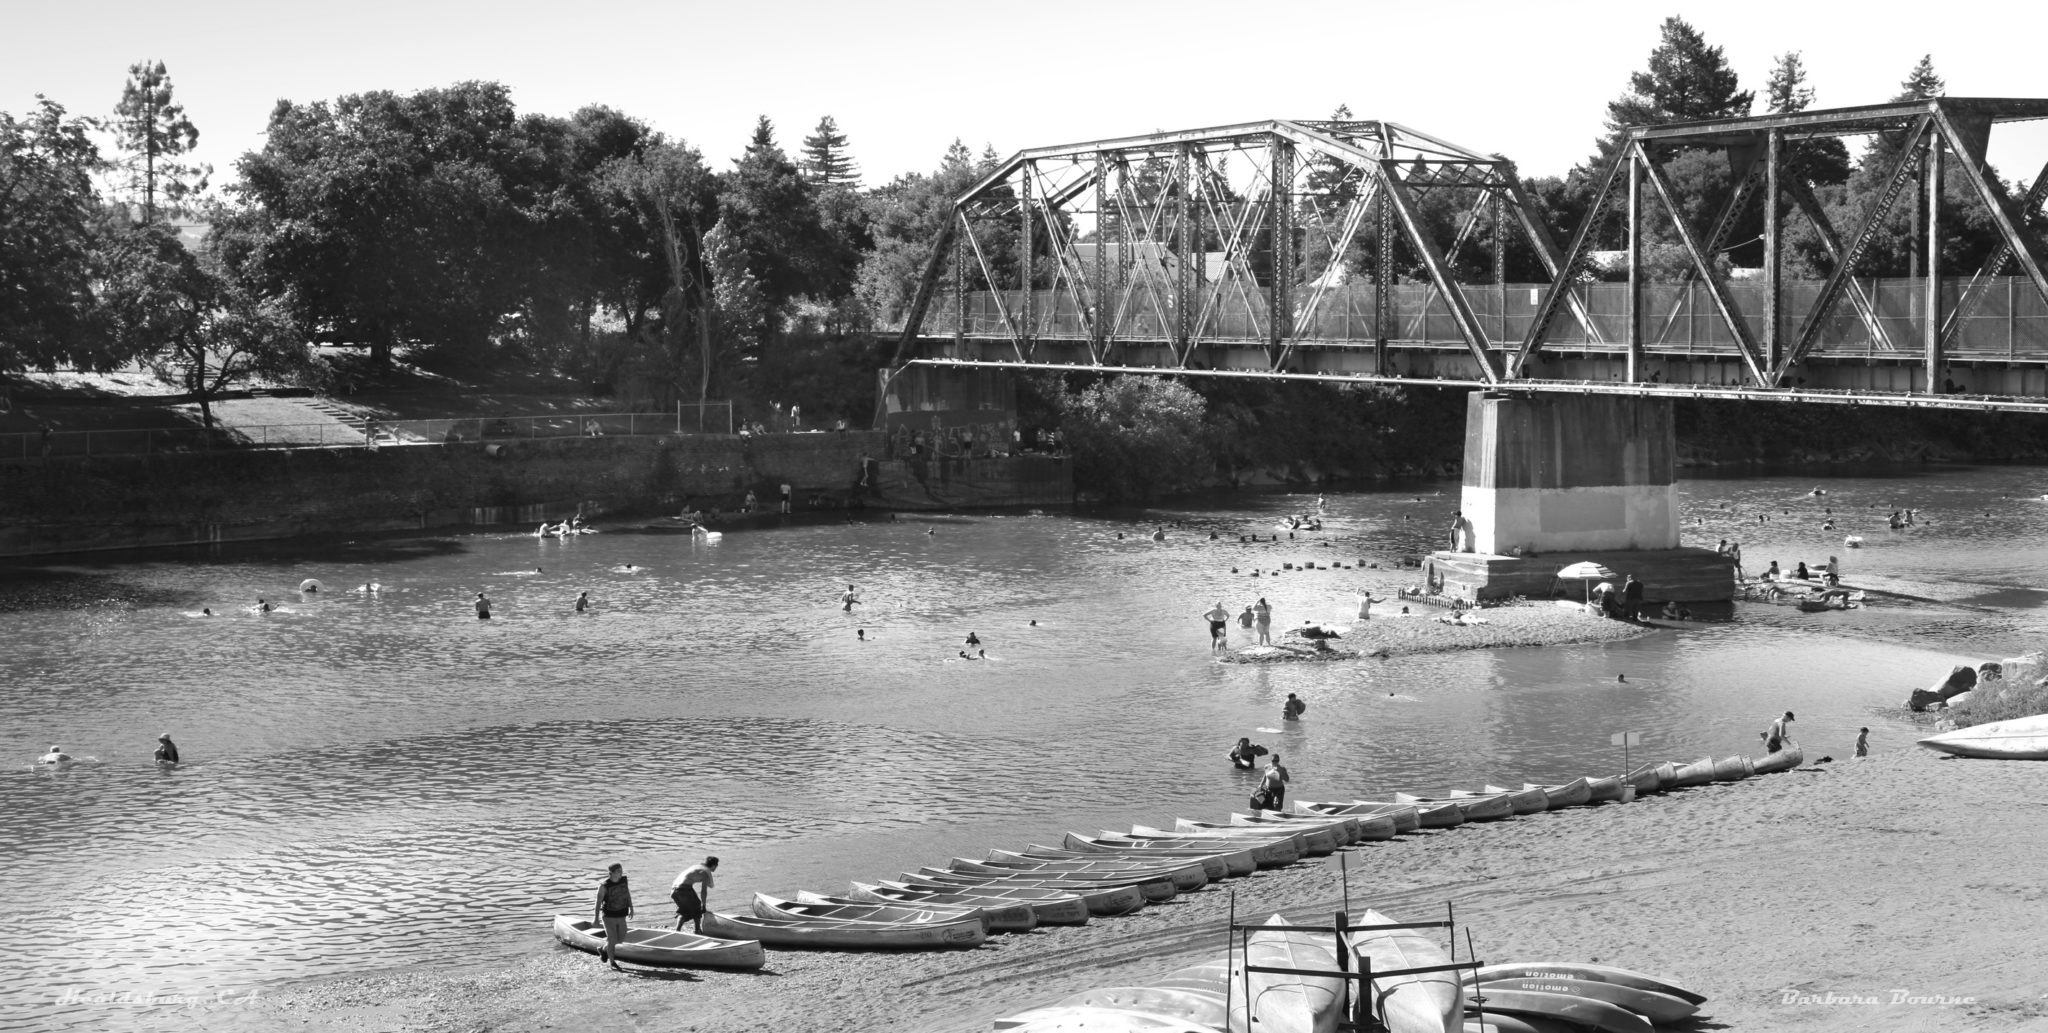 Russian River Canoes, Healdsburg, CA black and white canoes at the bridge